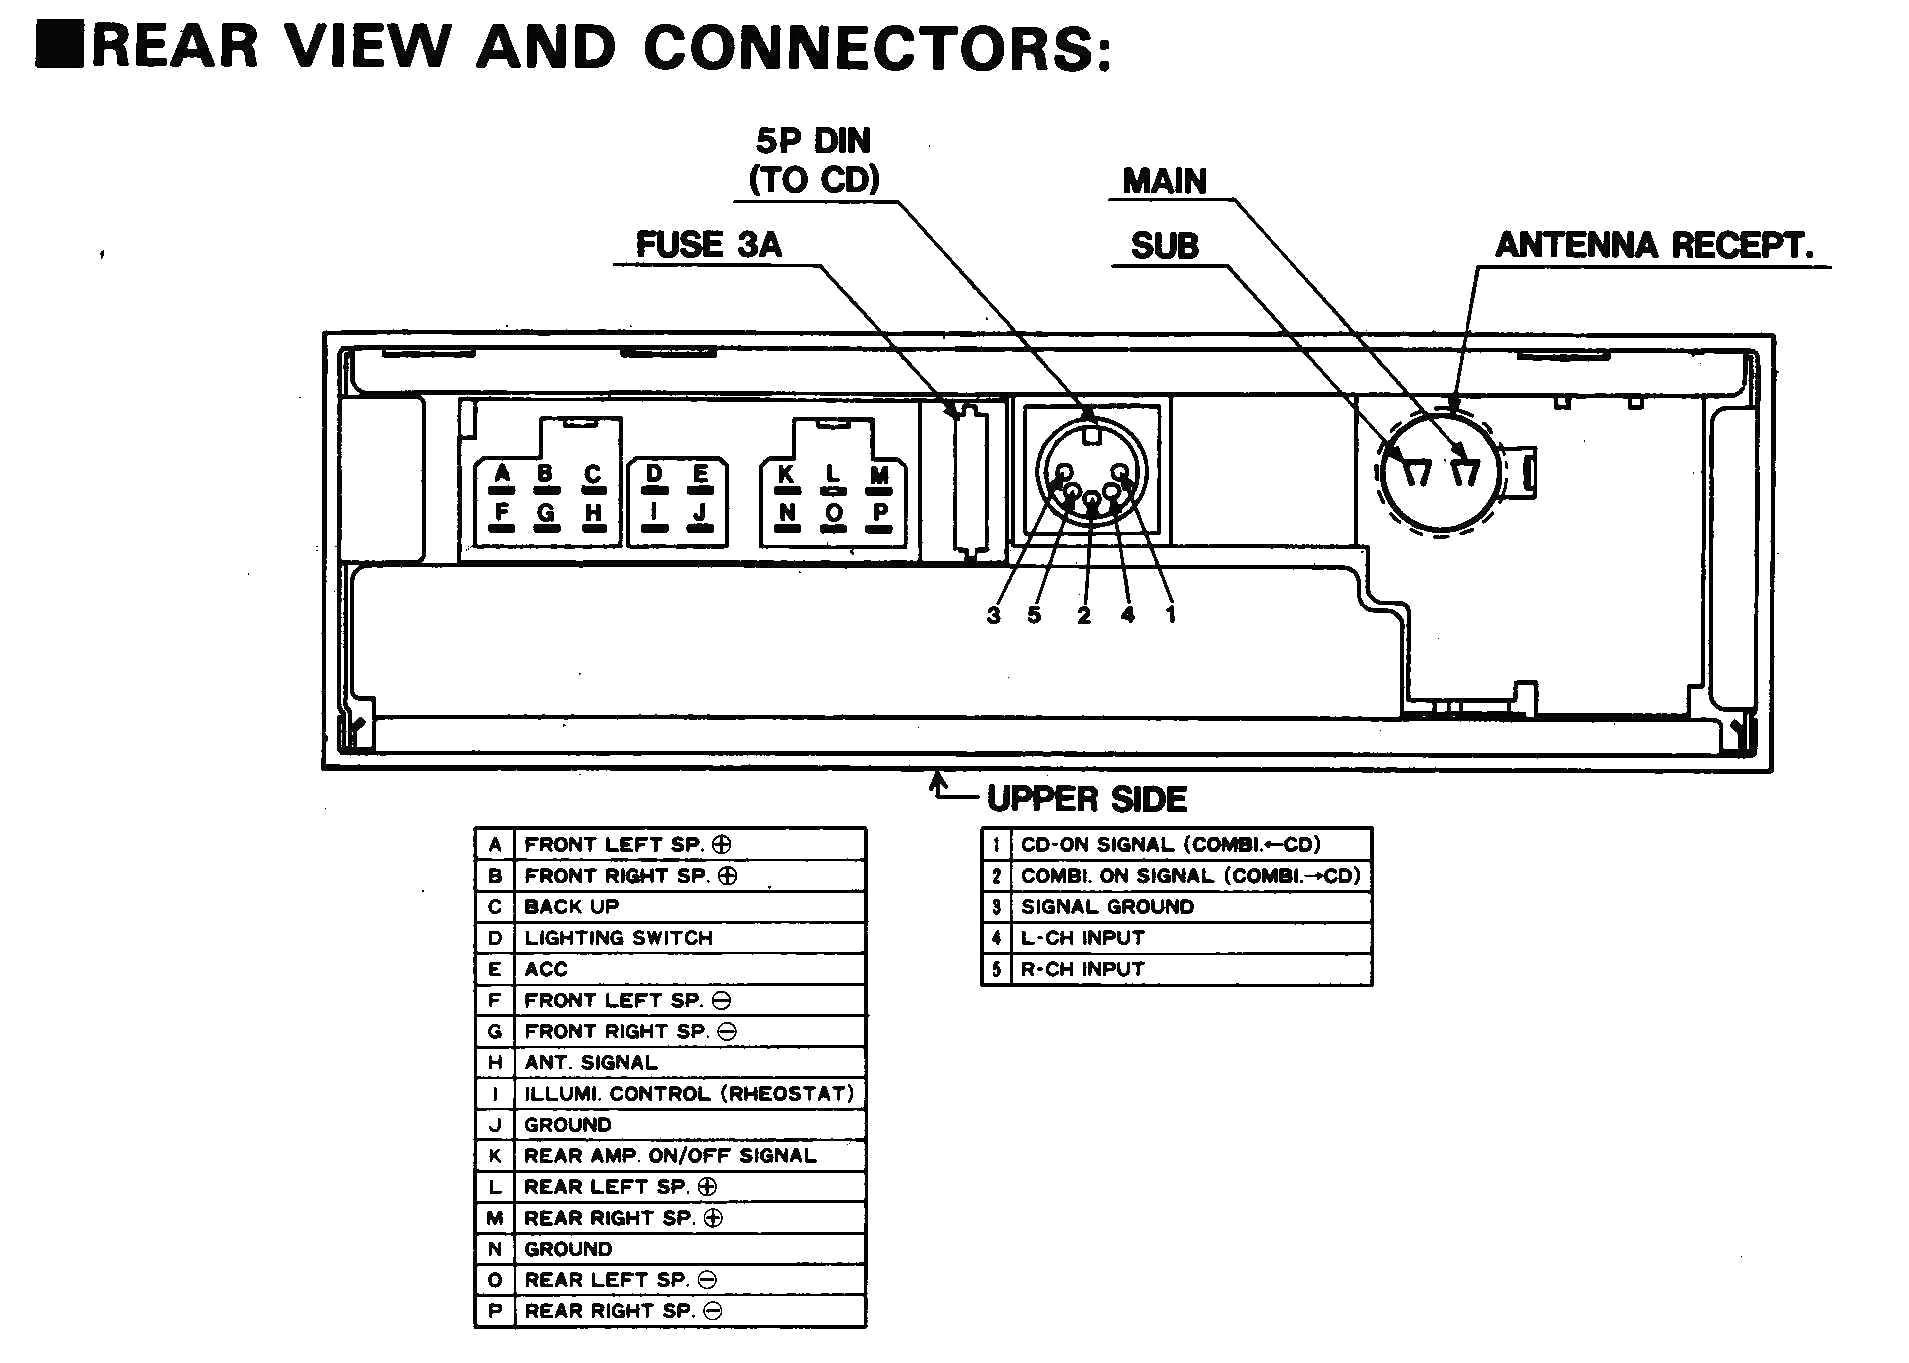 Car Speakers Wiring Diagram Factory Car Stereo Wiring Diagrams In Jpg Striking Speaker Diagram Of Car Speakers Wiring Diagram